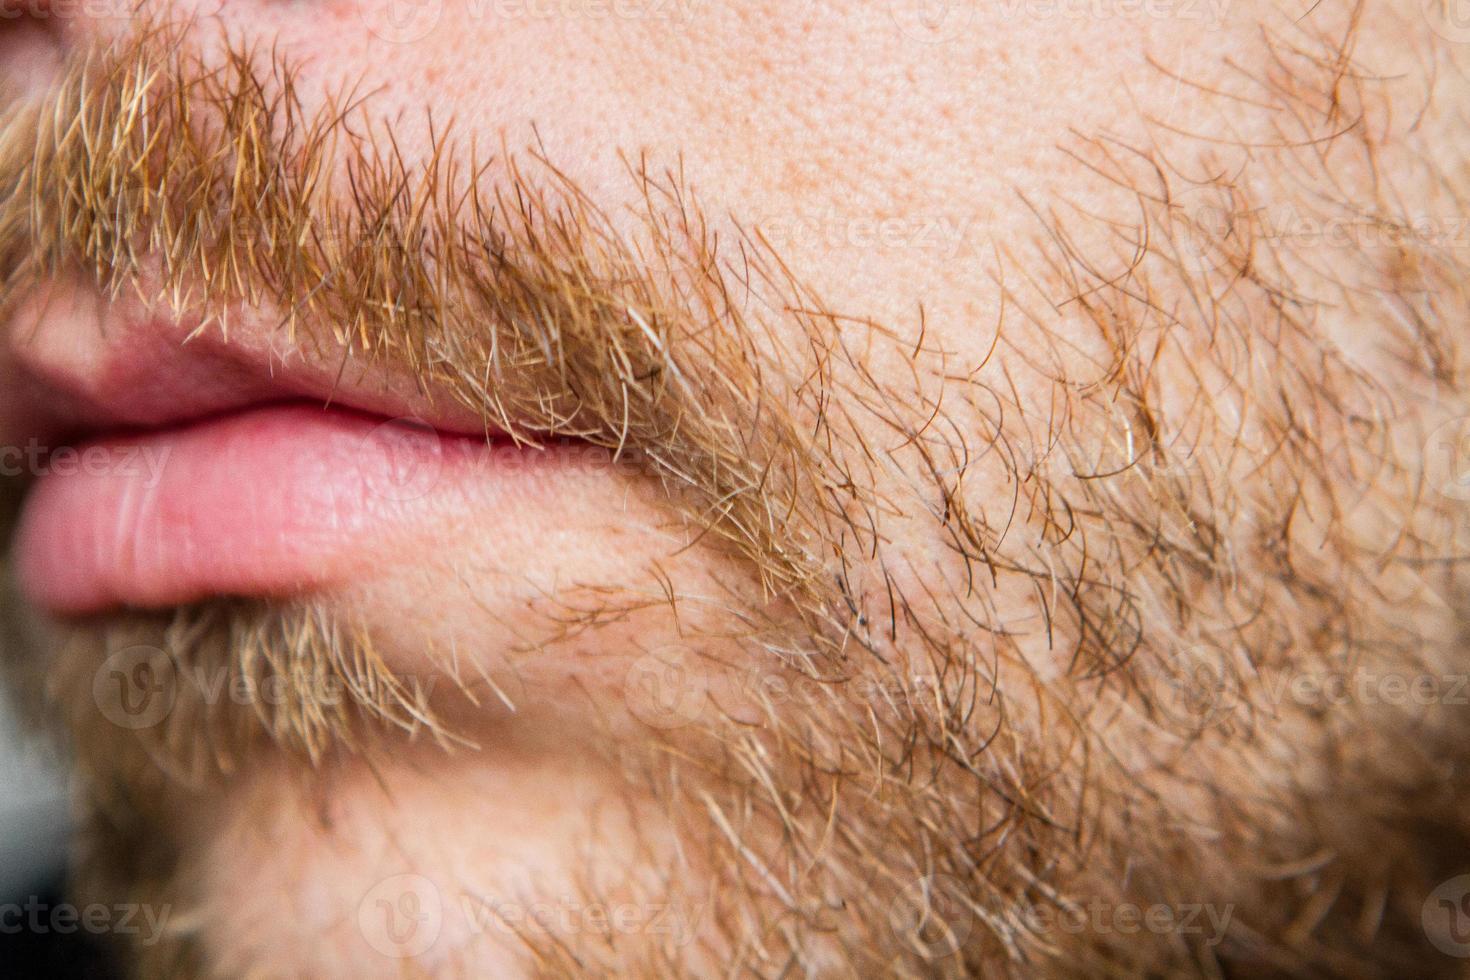 Beard and Facial Hair photo